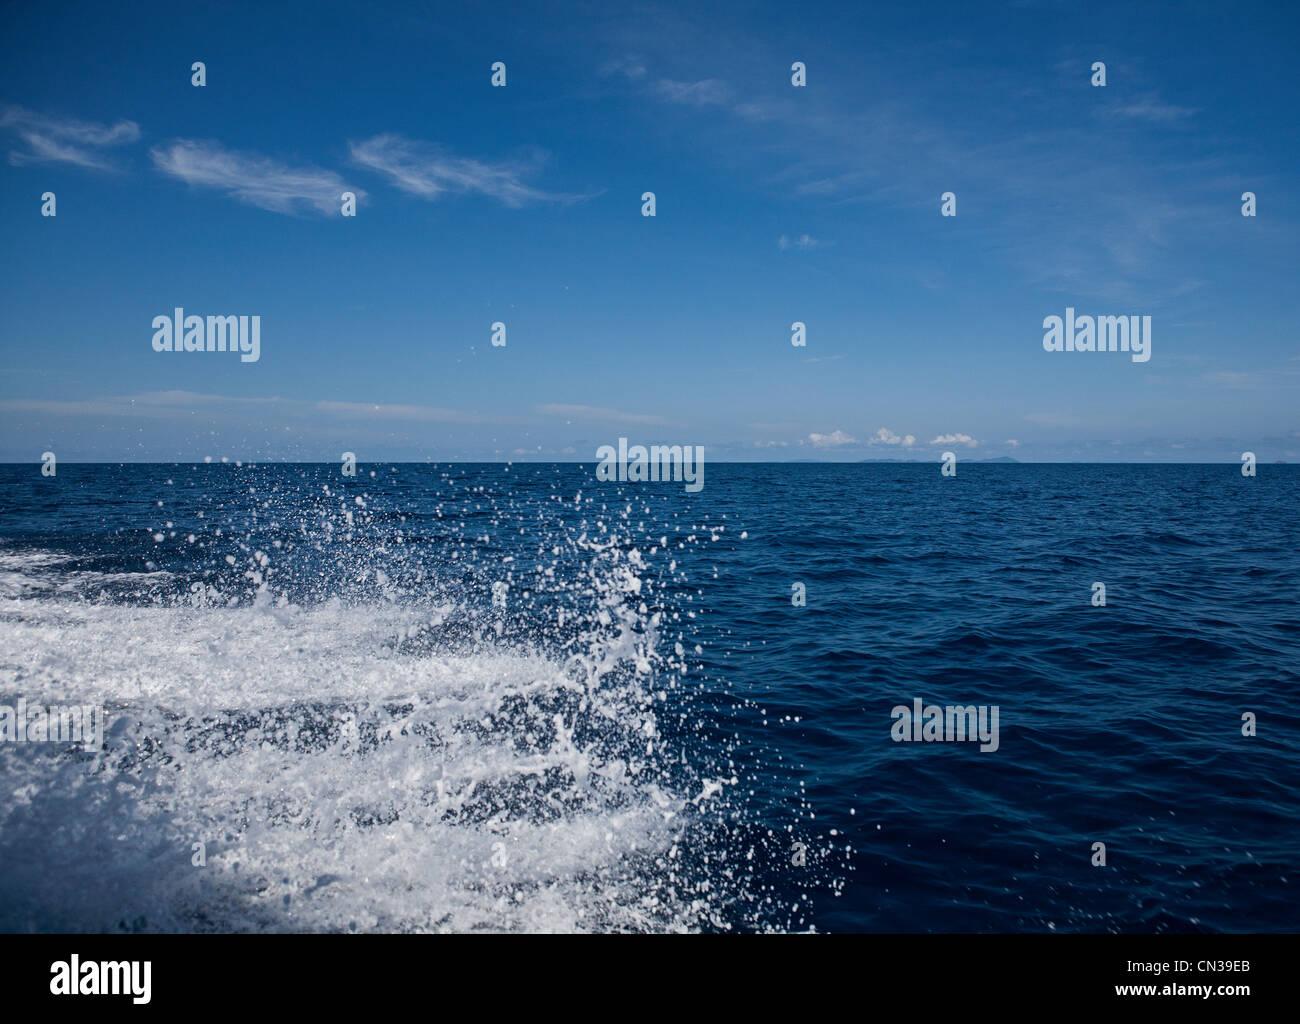 Sea spray from speedboat on South China Sea near Tioman Island, Malaysia - Stock Image